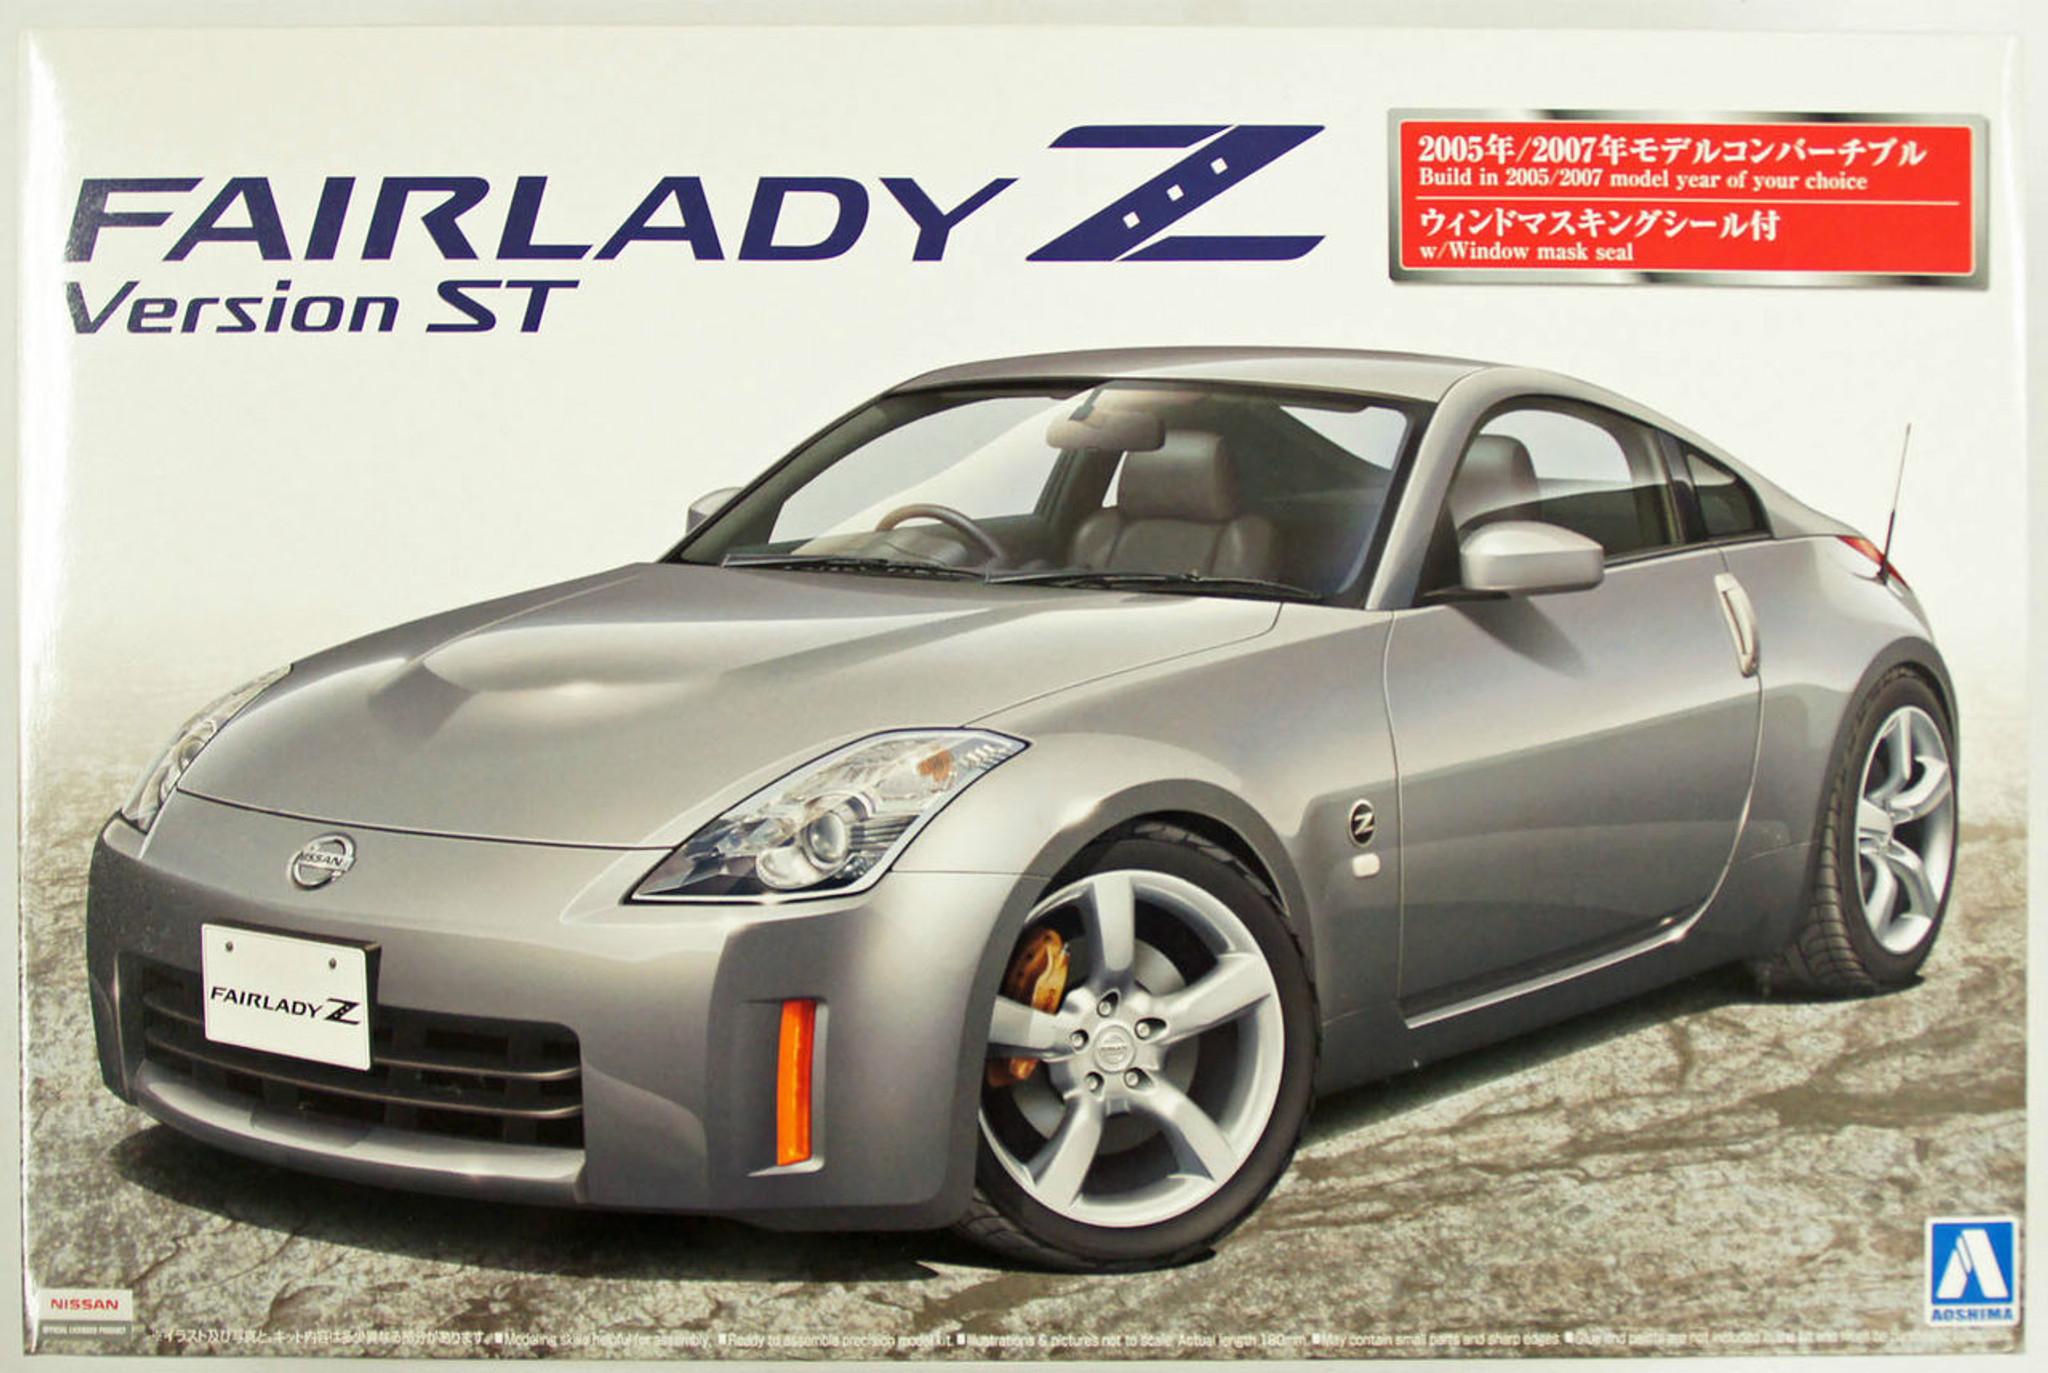 Nissan 350z Plastic Model Kit Recomended Car Tamiya 24254 1 24 Track Fairlady Aoshima 11966 Z Version St 2005 2007